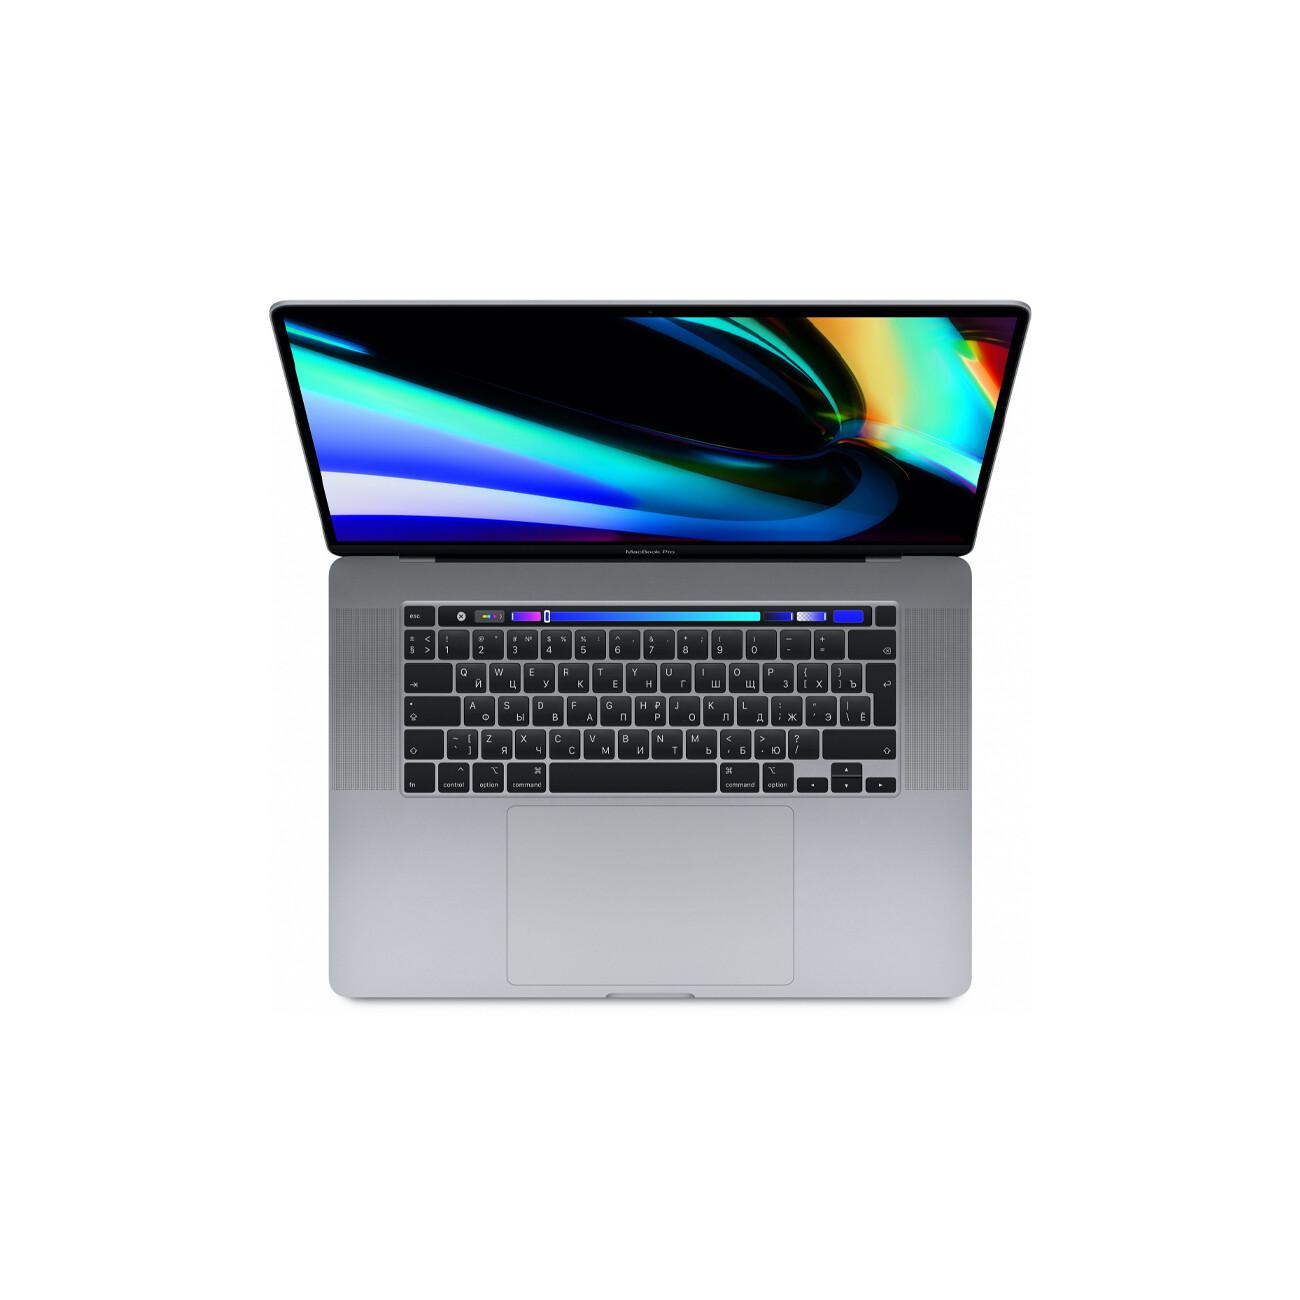 "Apple MacBook Pro 16"" 6 Core i7 2,6 ГГц, 16 ГБ, 512 ГБ SSD, AMD Radeon Pro 5300M, Touch Bar, «серый космос»"